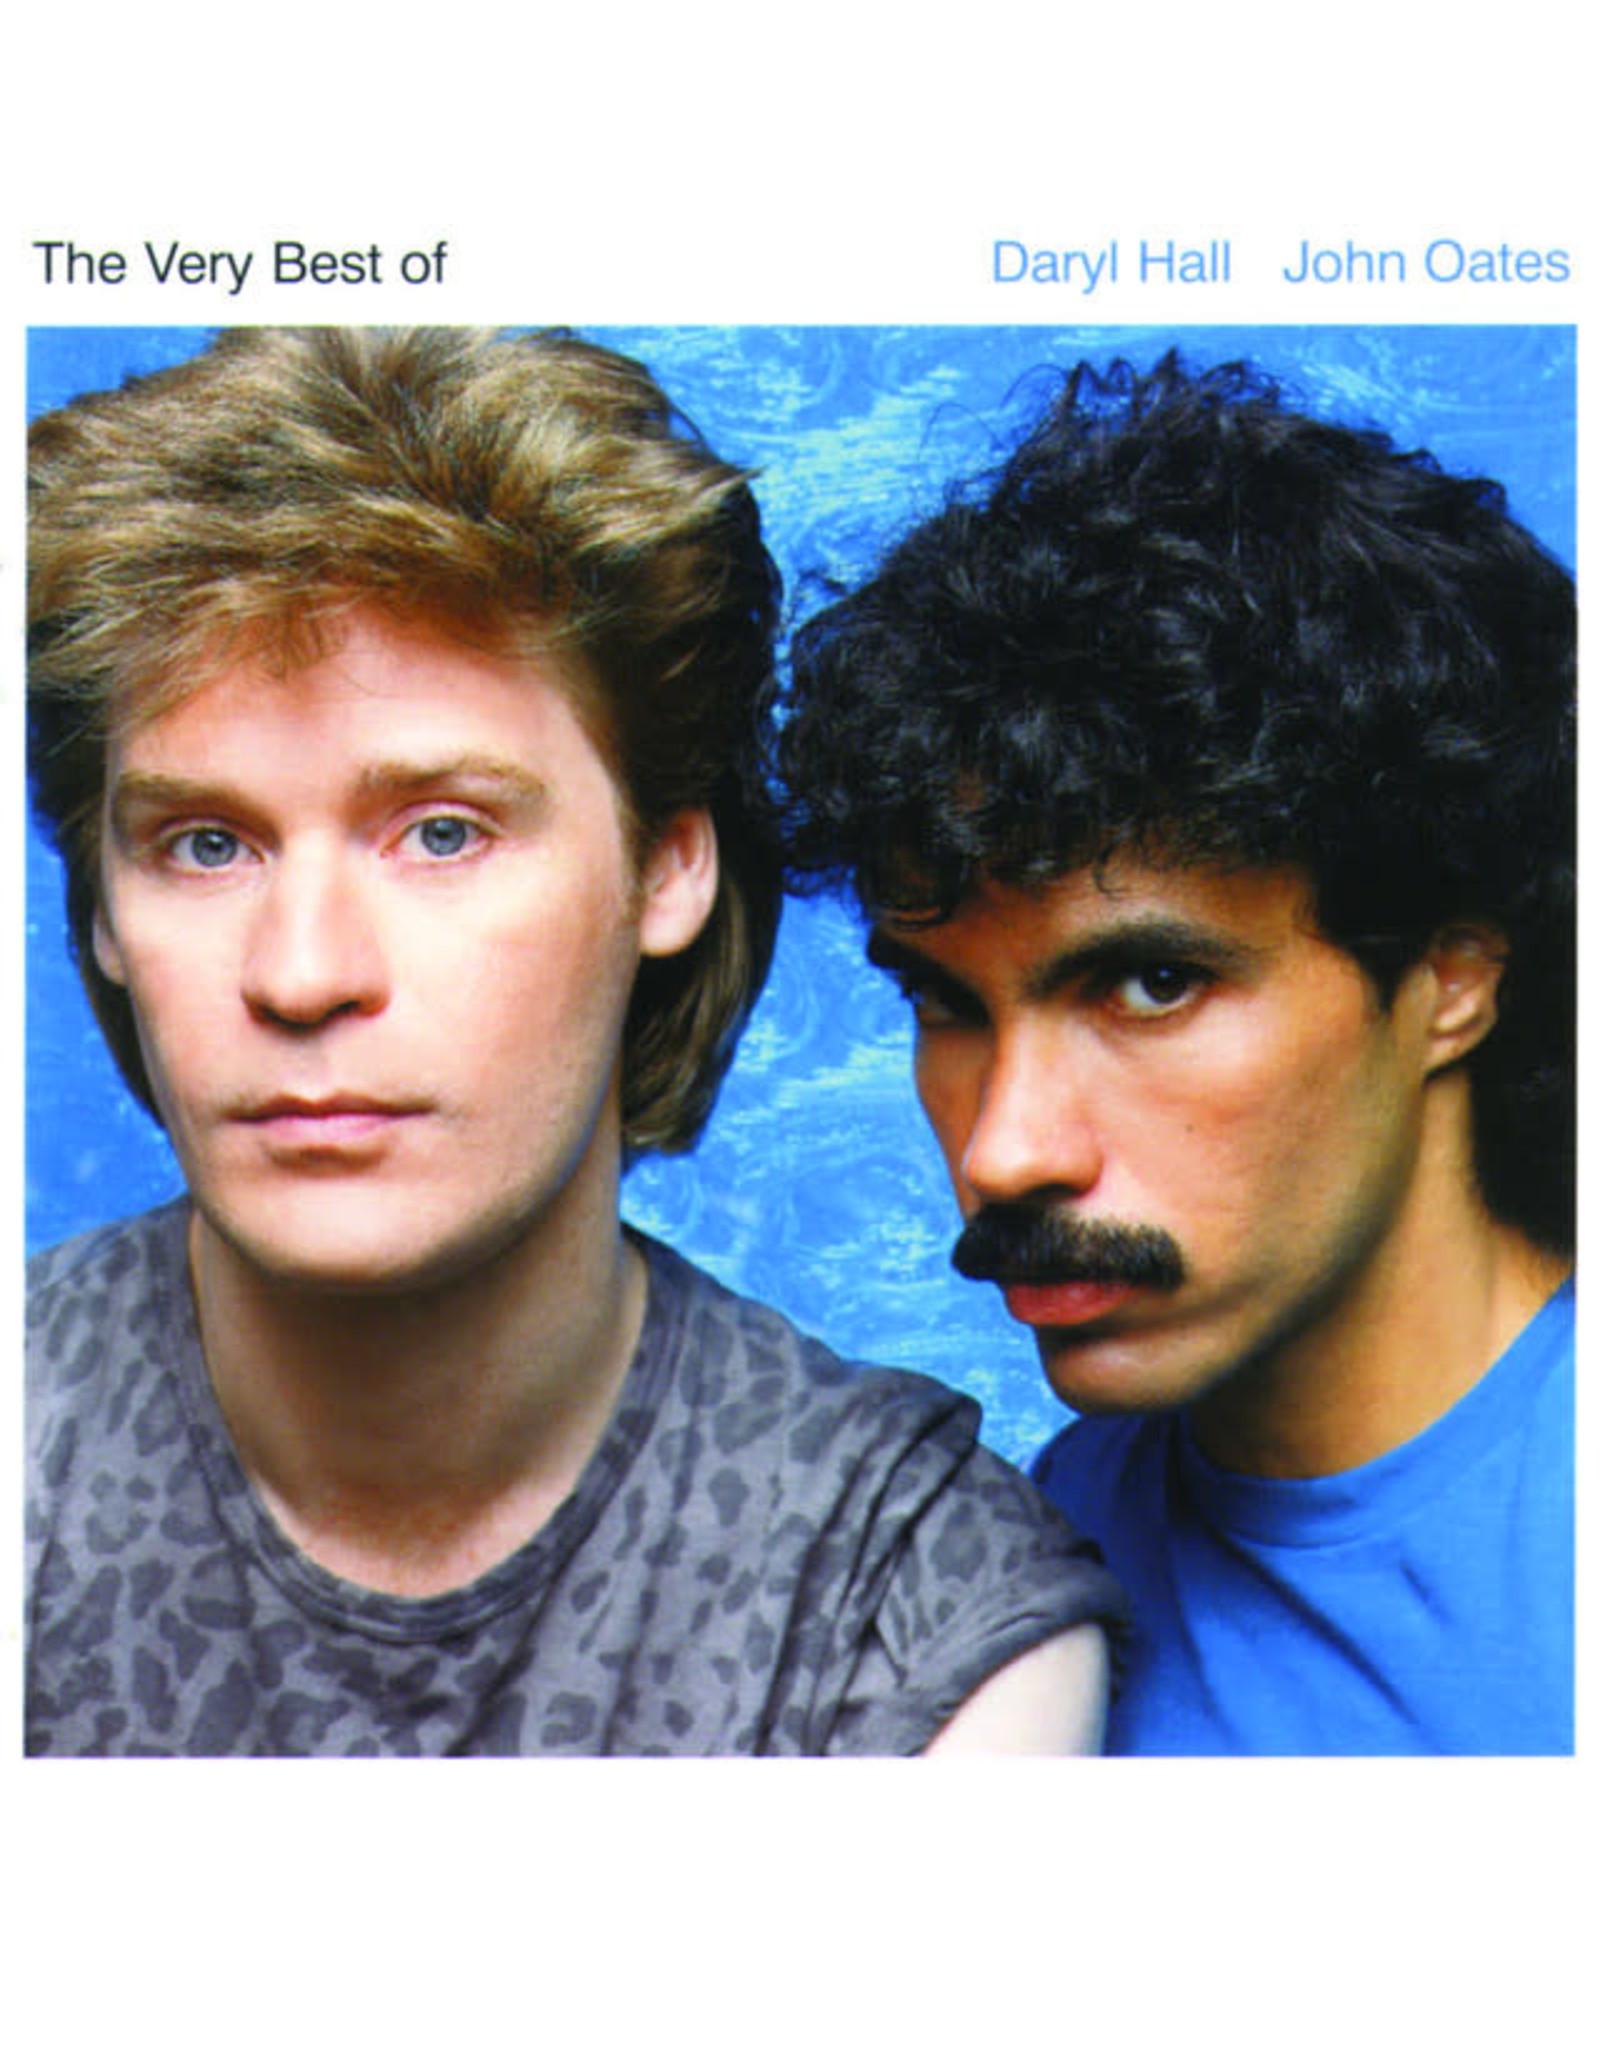 Vinyl Daryl Hall & John Oates - The Very Best Of